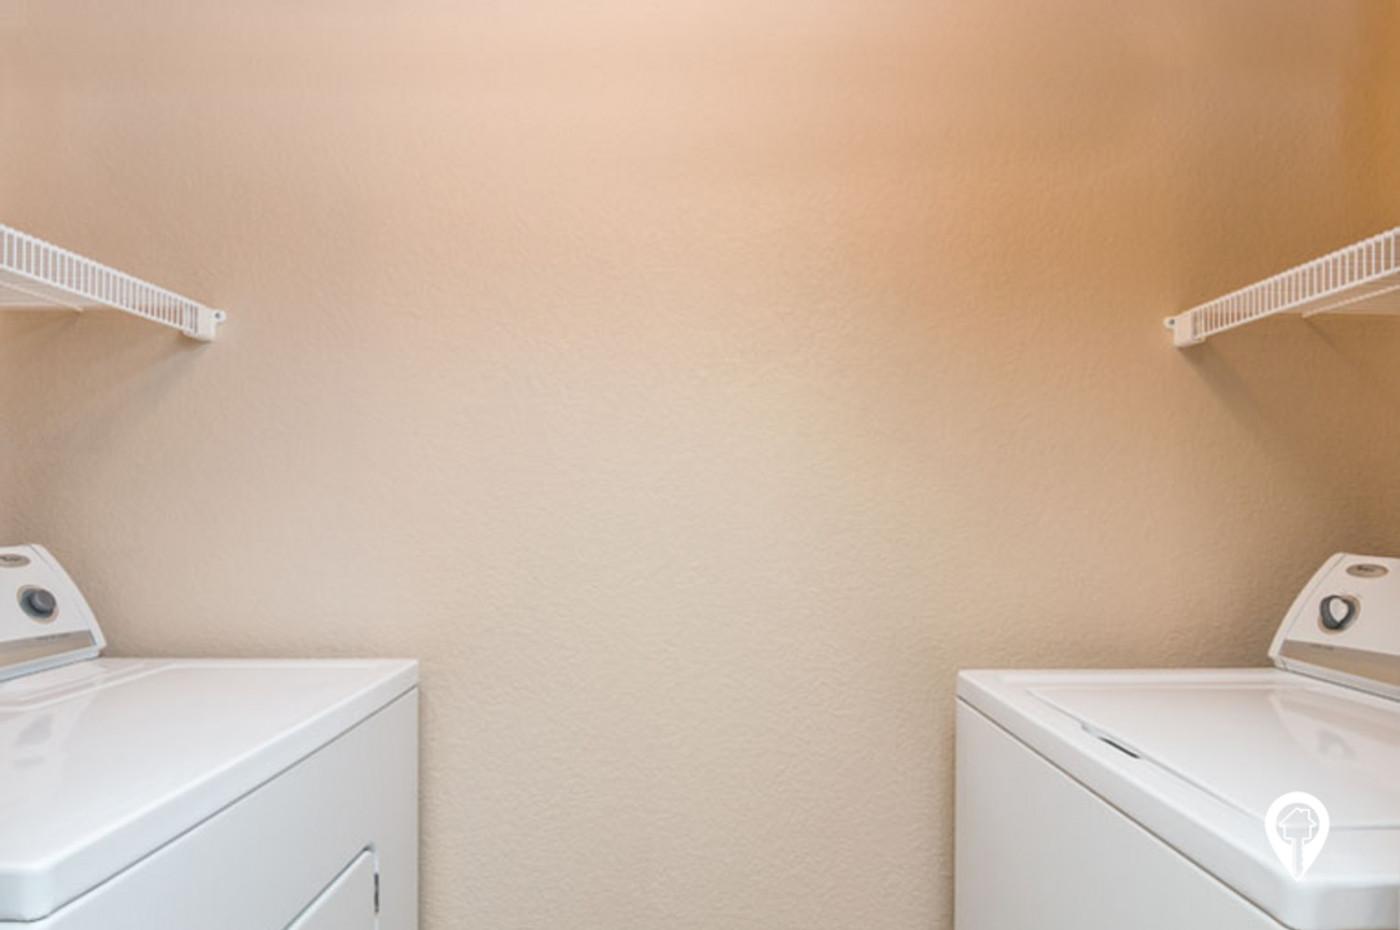 Homestead-Garden-In-Home-Washer-Dryers